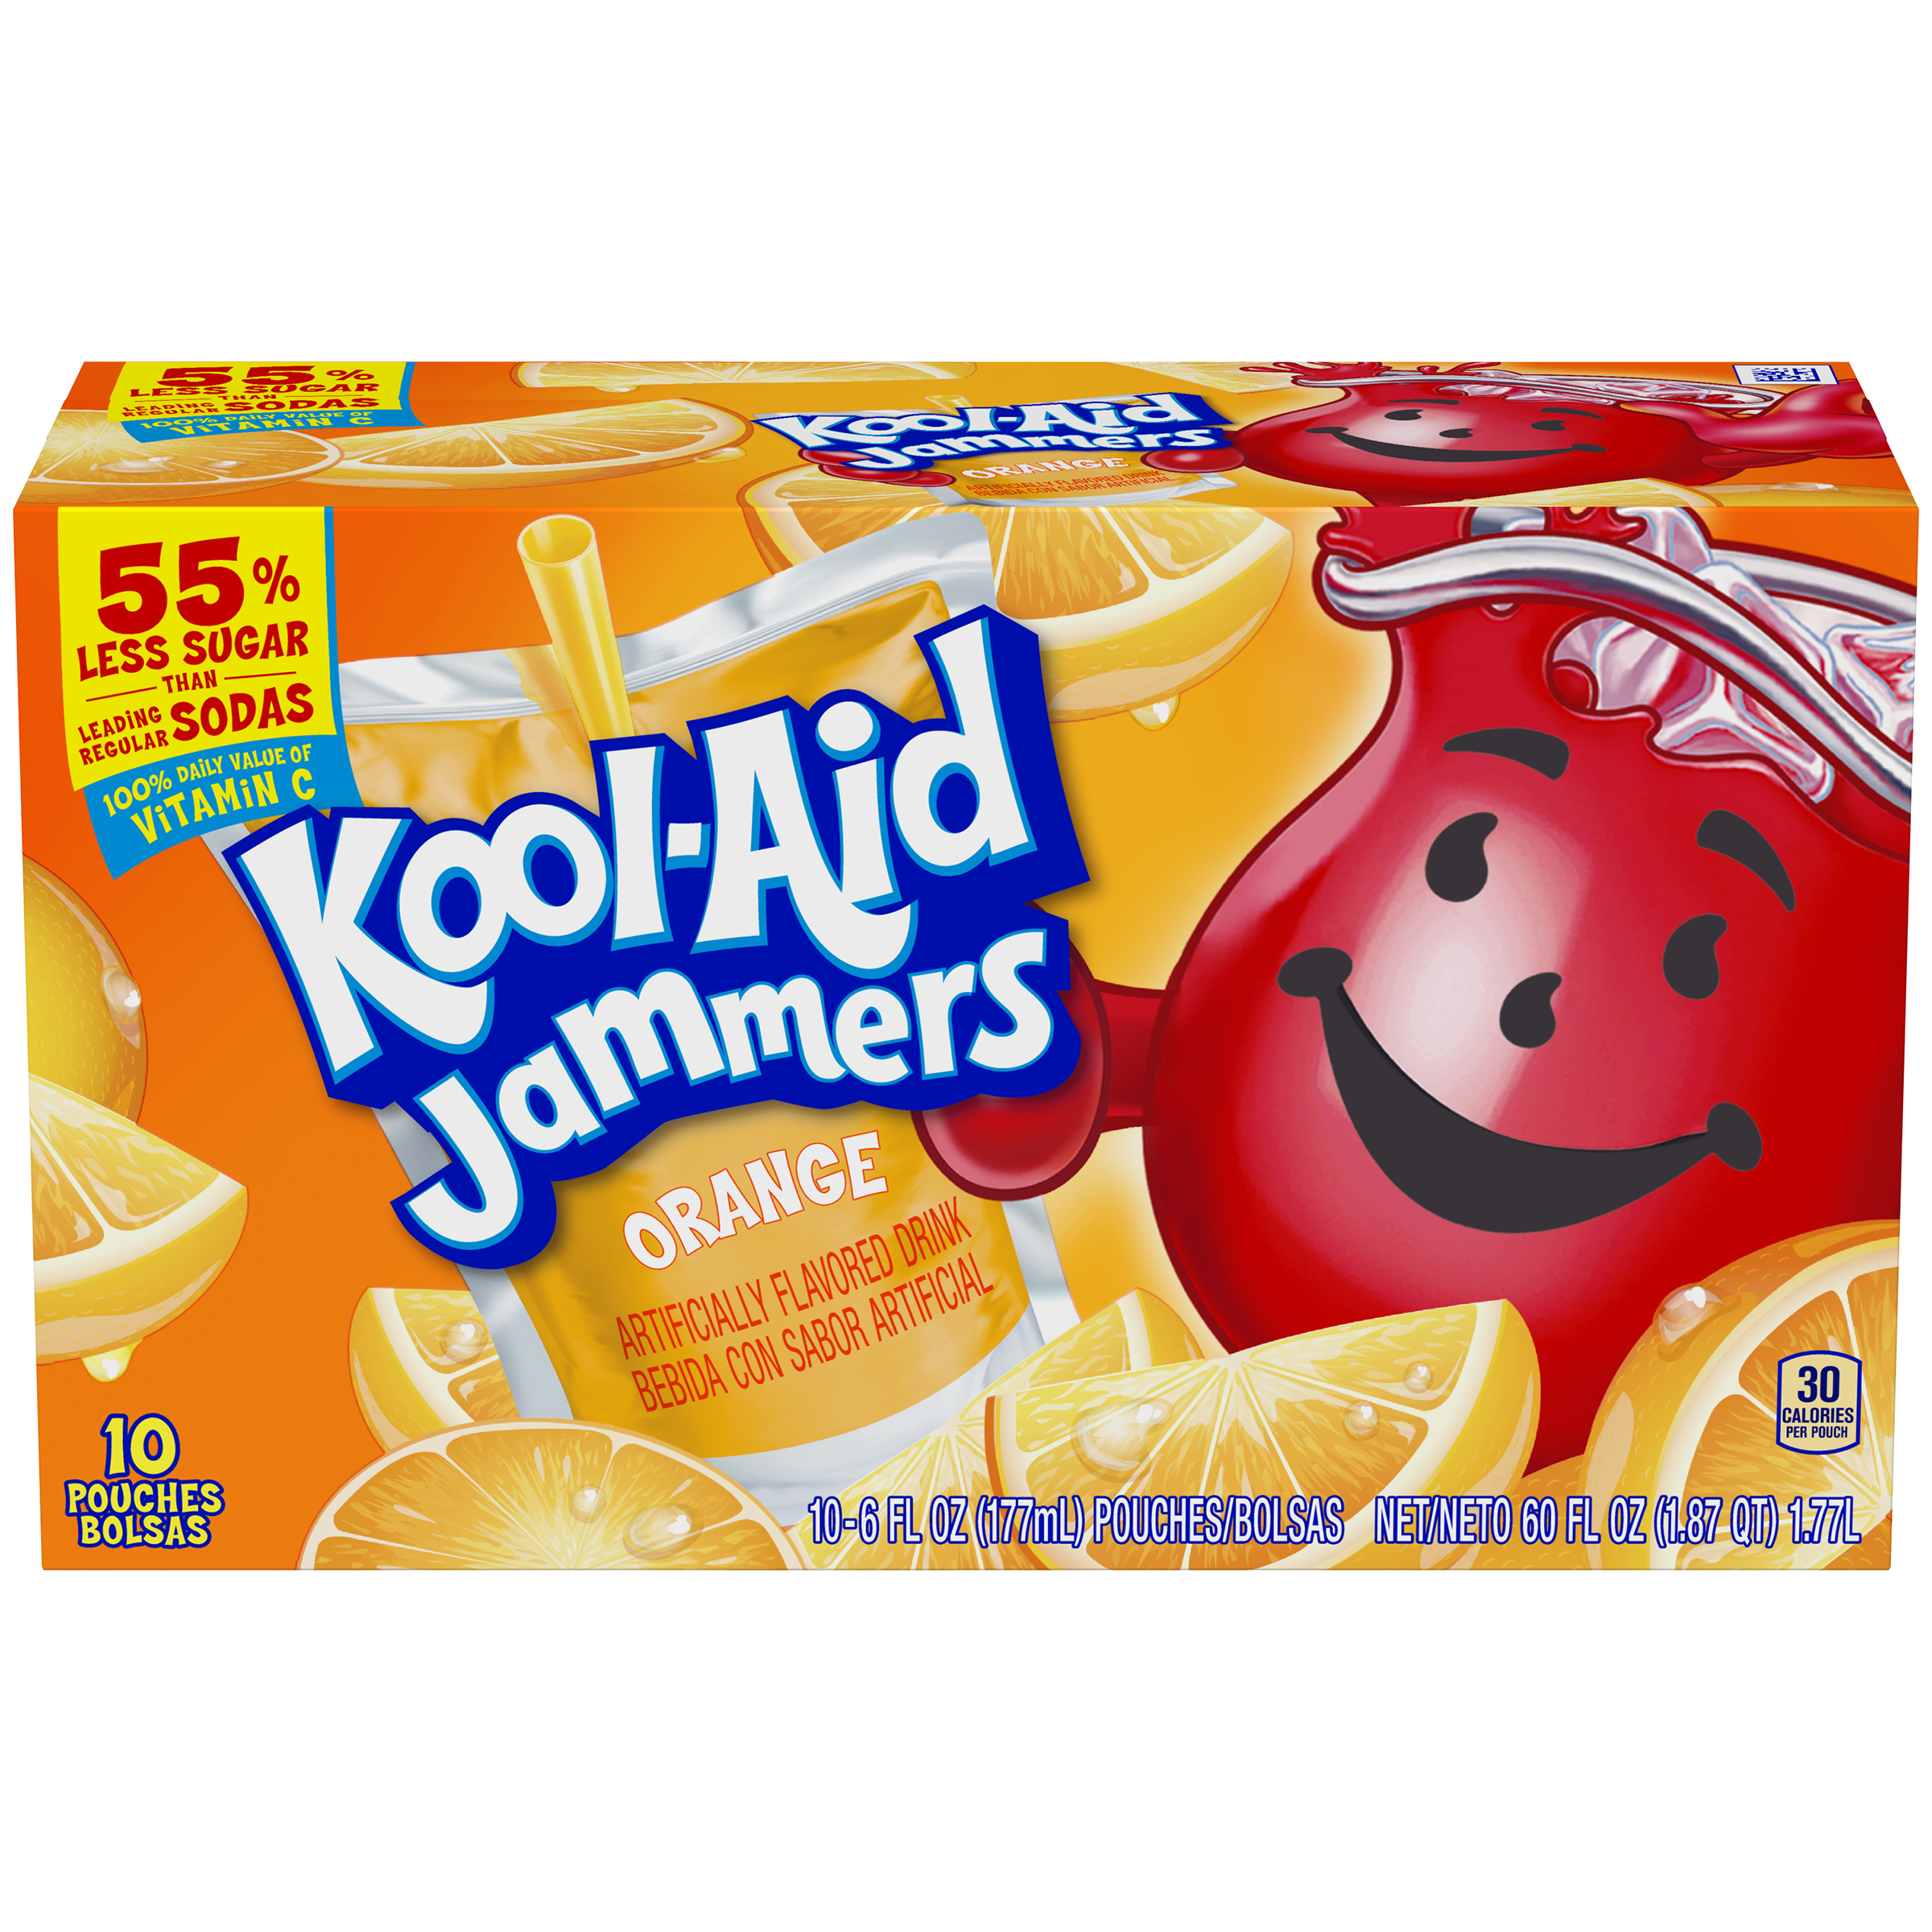 Kool-Aid Jammers Orange Flavored Drink 60 fl oz Box (10-6 fl oz Pouches) image